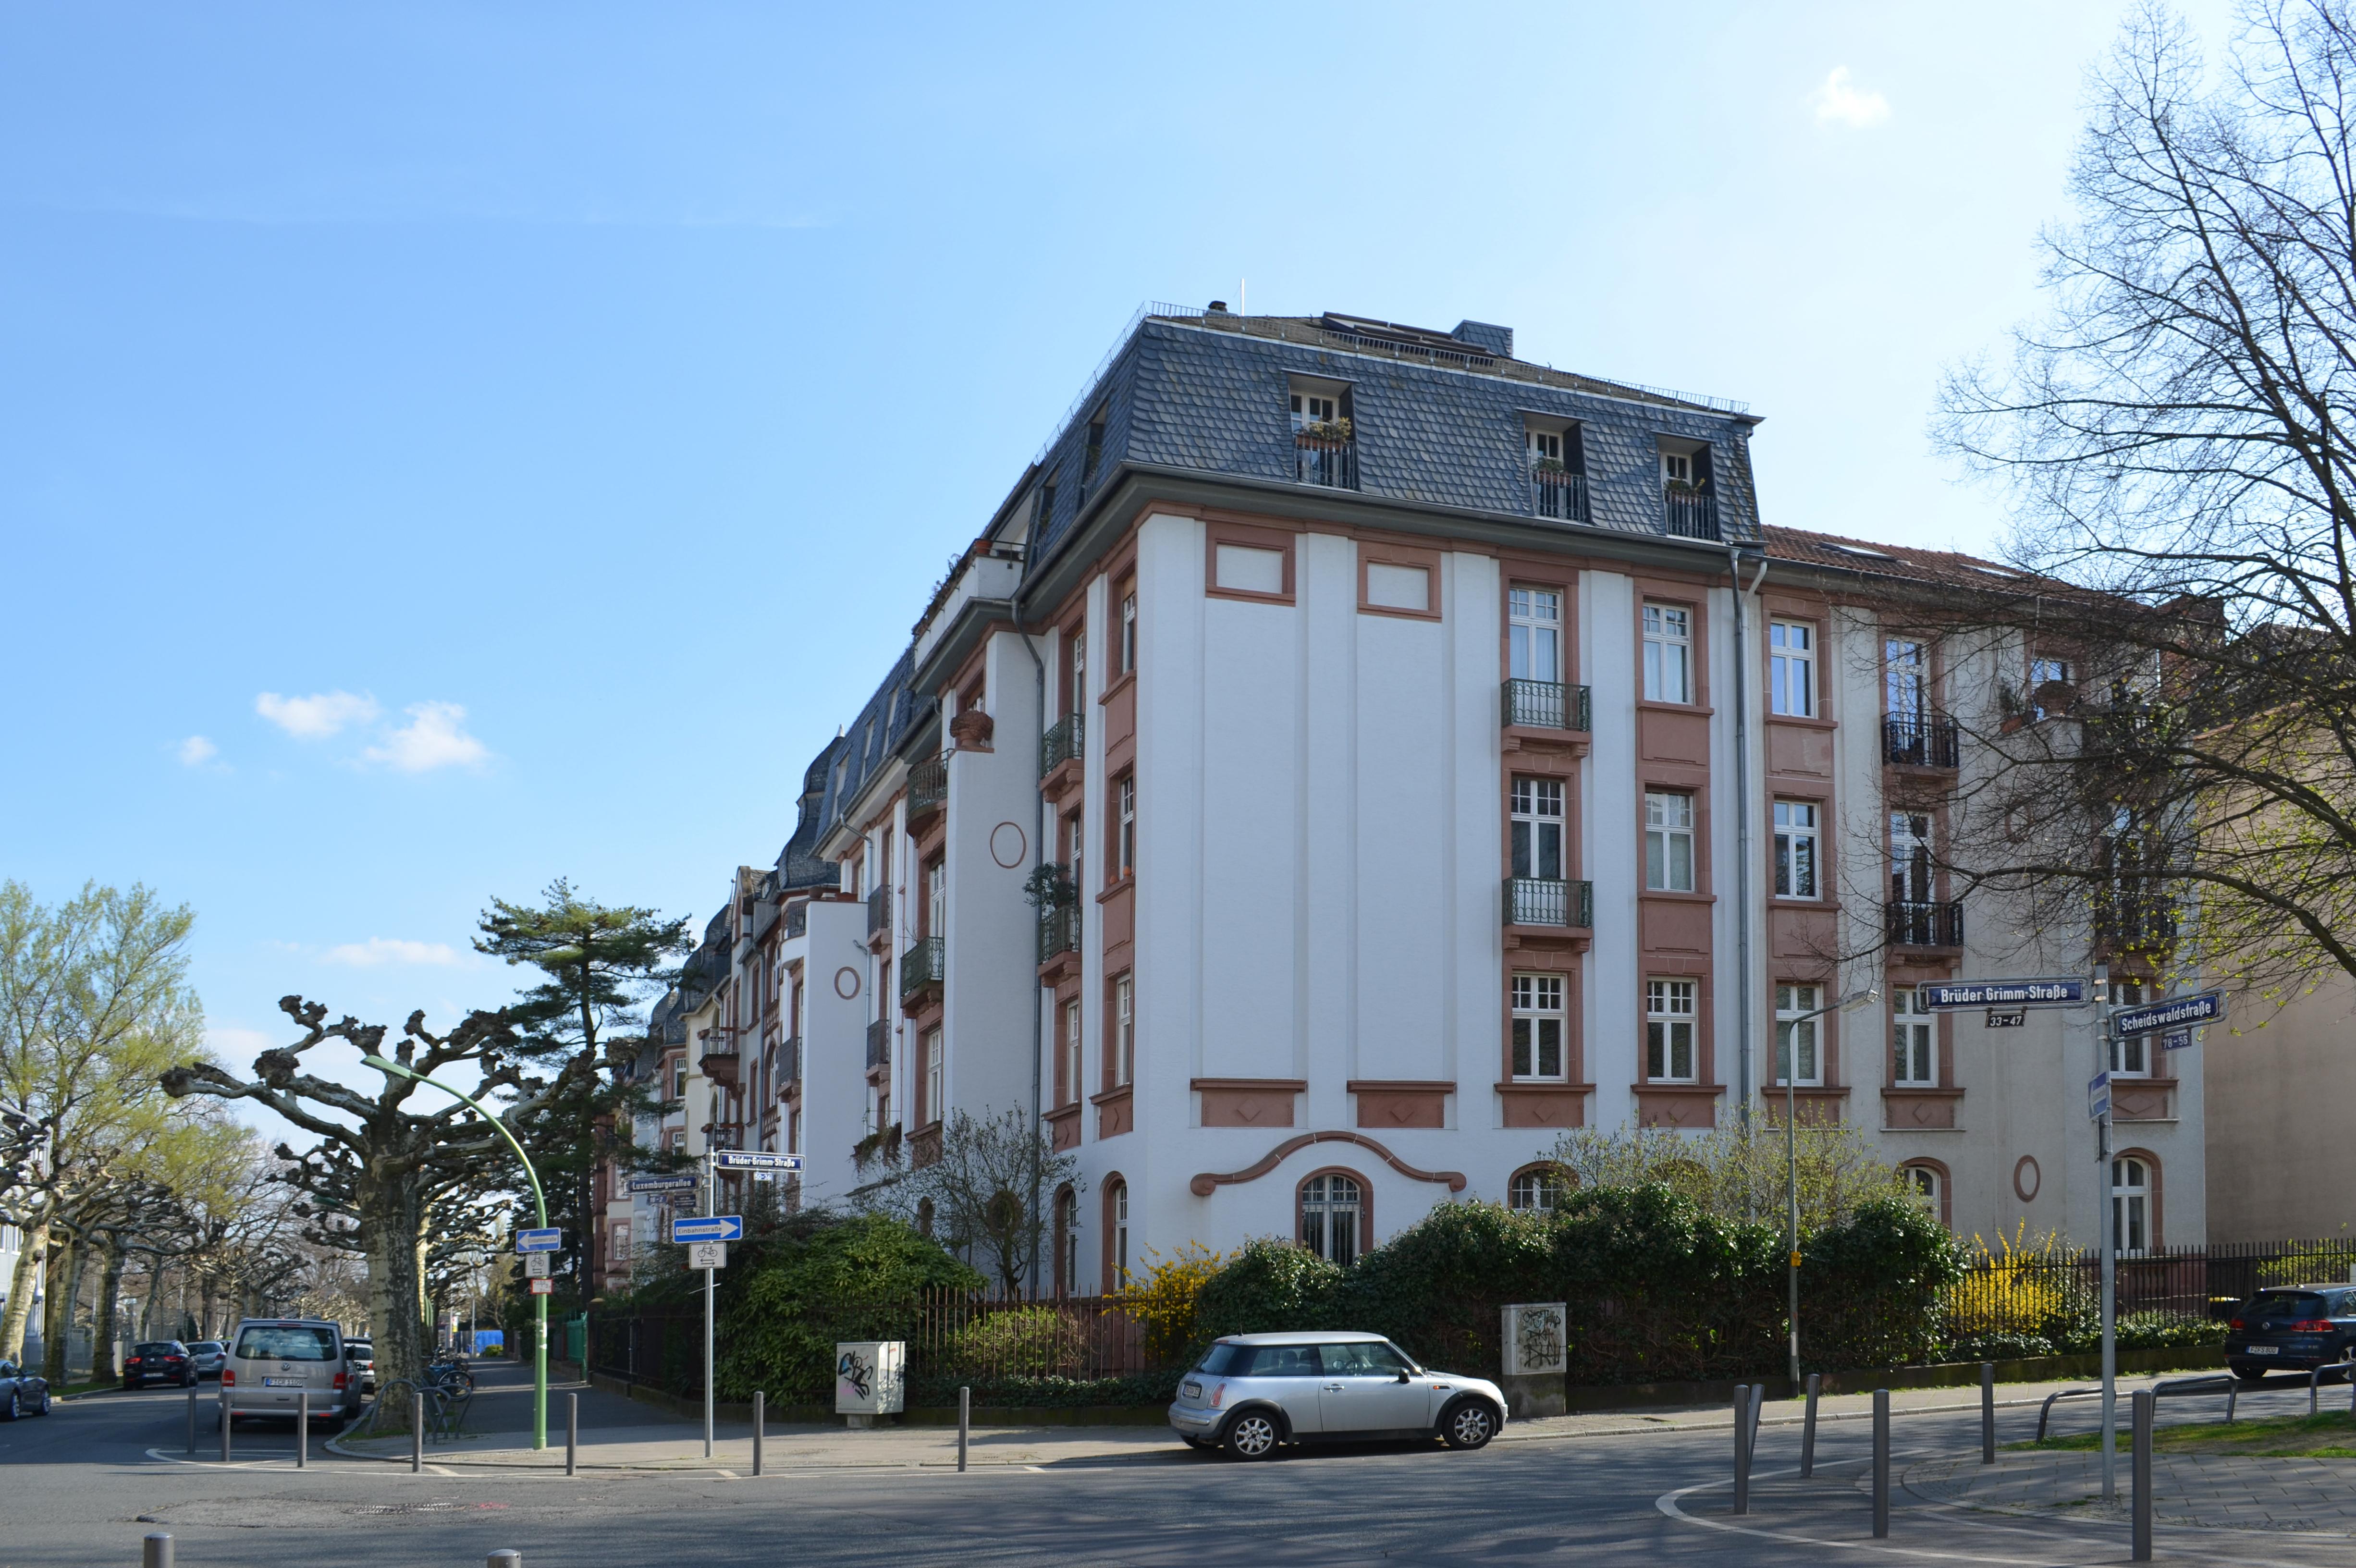 Baufirmen Frankfurt baufirmen in frankfurt kinder sind kein eigentum frankfurt am